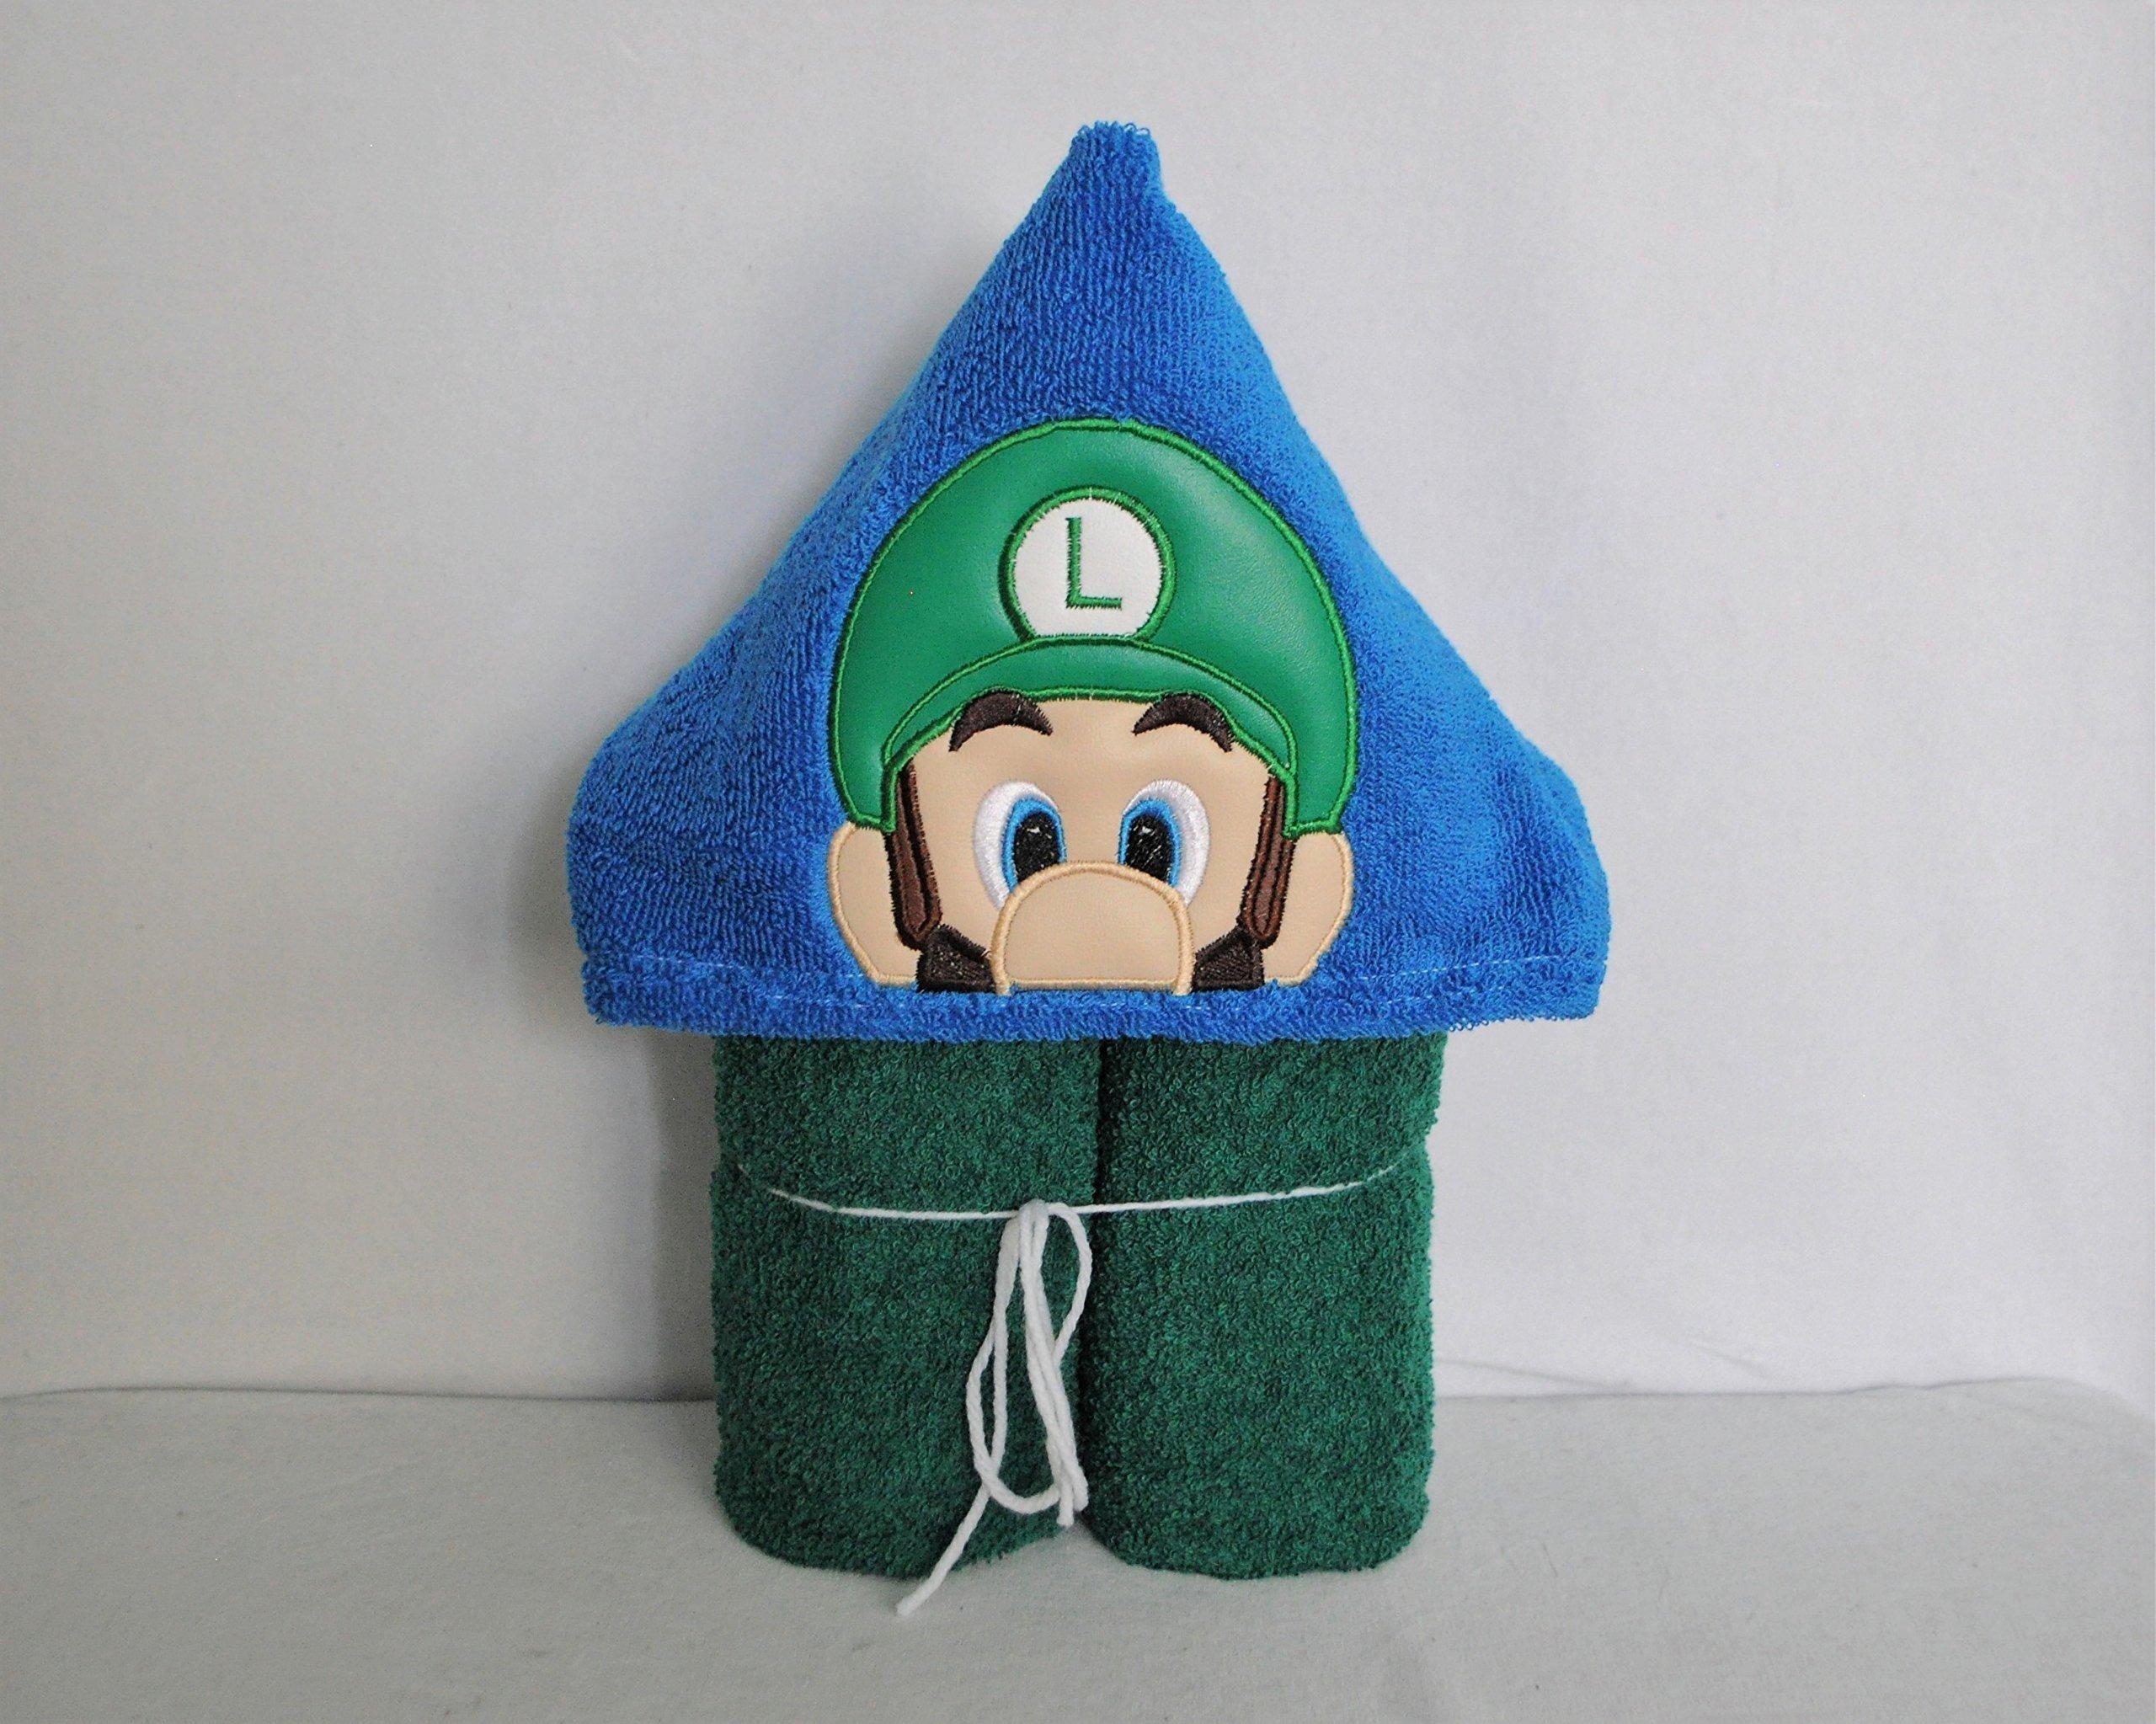 Green Super Game Guy Hooded Bath Towel - Baby, Child, Tween